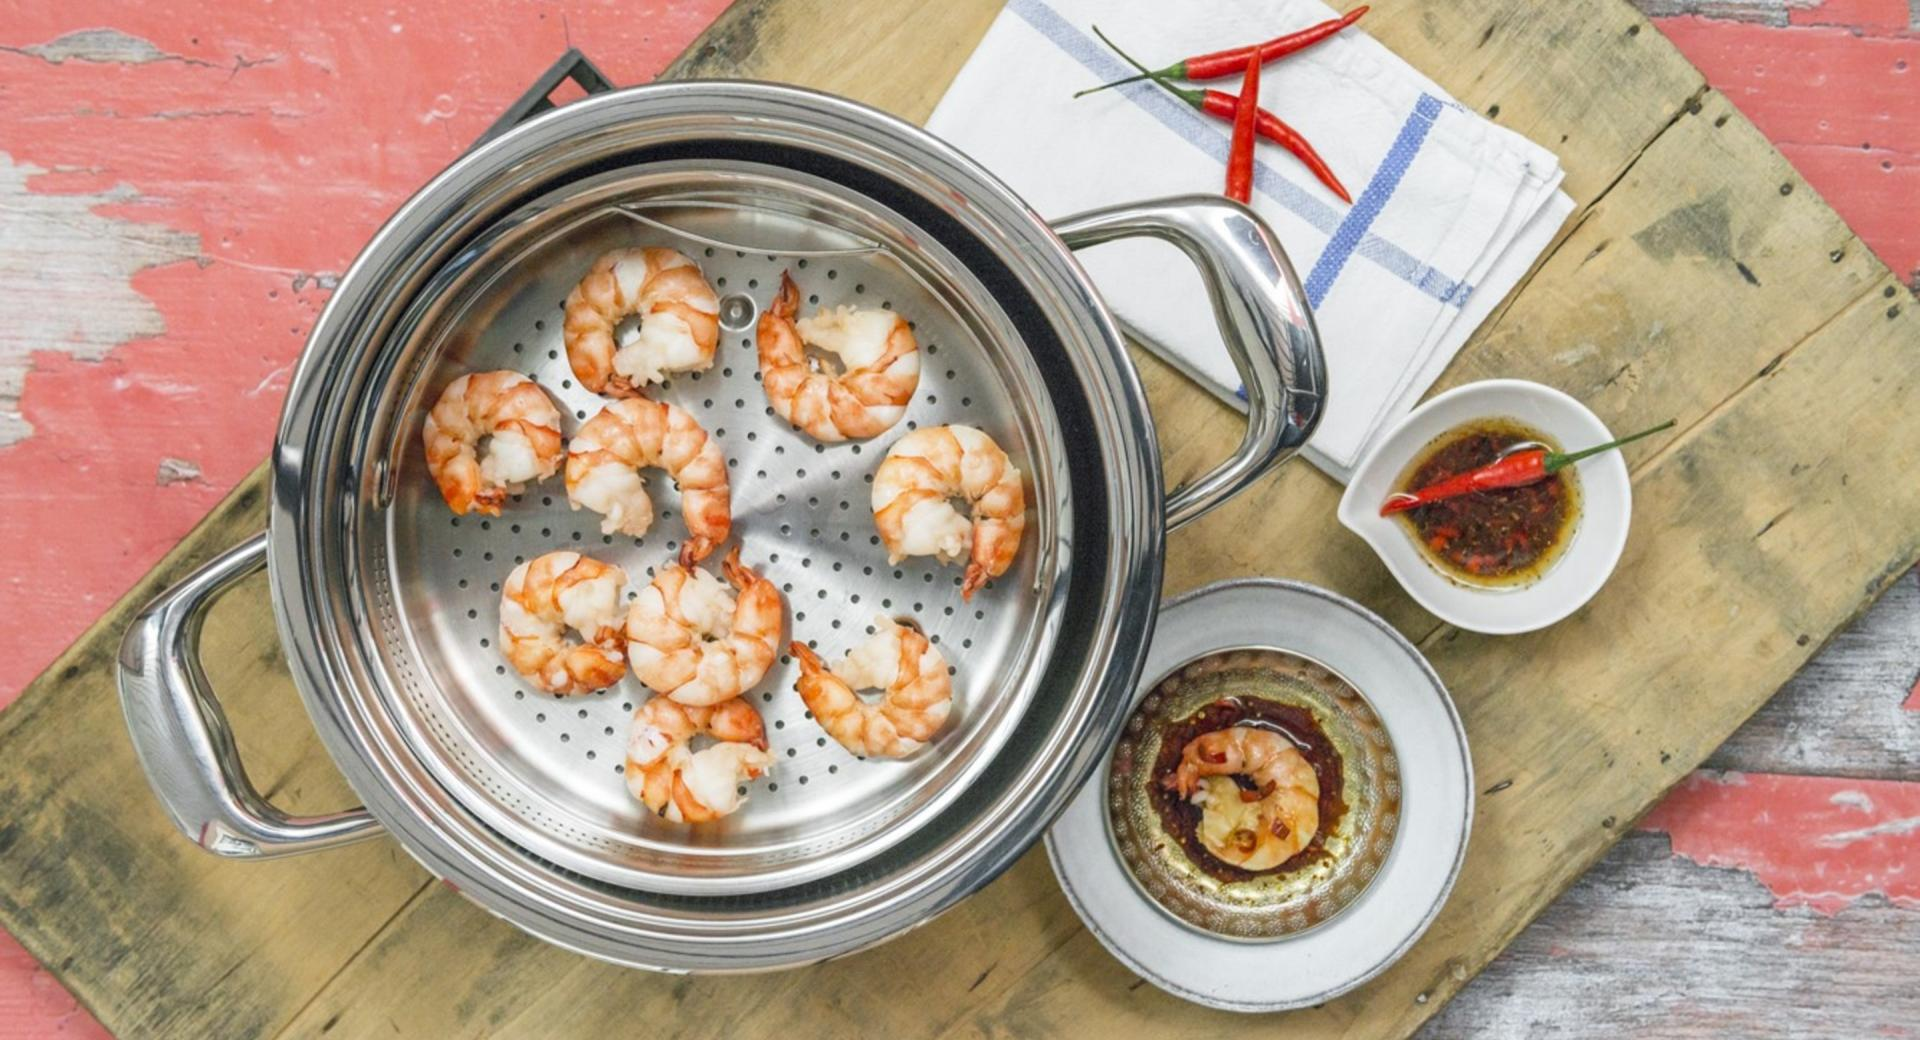 Jumbo shrimp with chili-infused oil